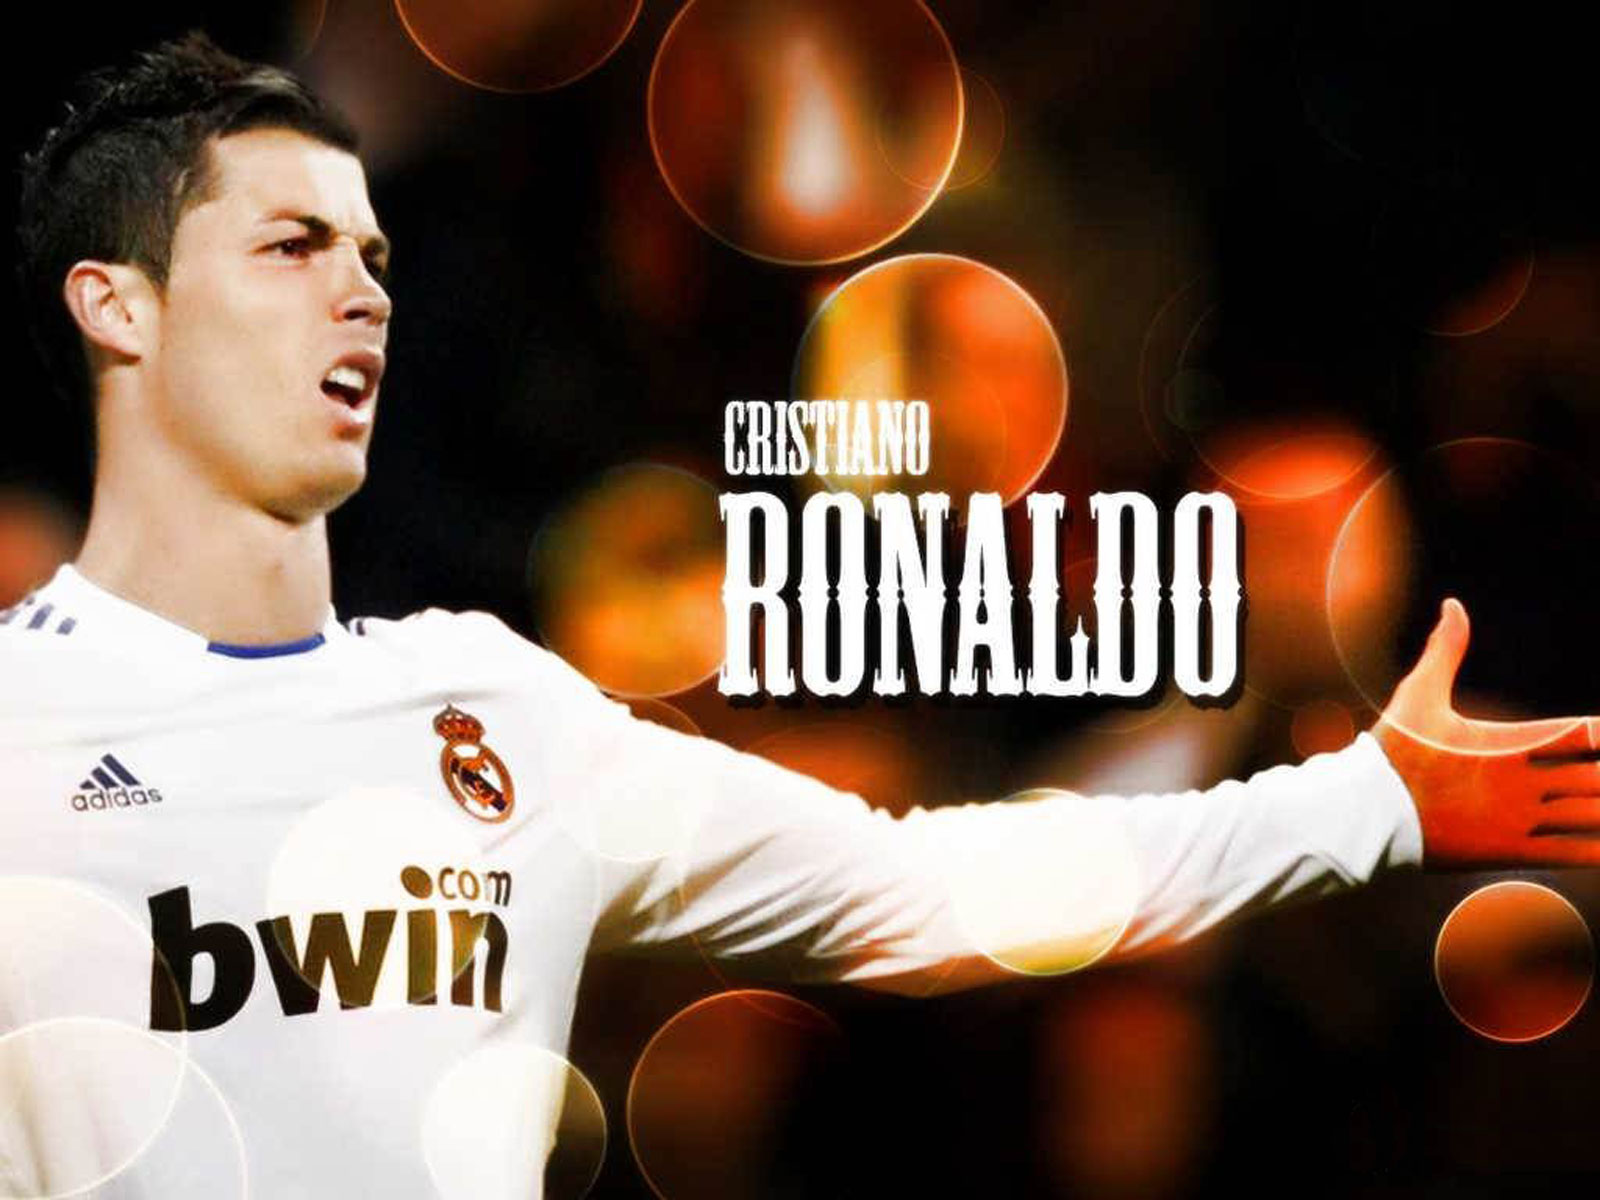 http://1.bp.blogspot.com/-w-d9tzzeePw/UQLyDNPItUI/AAAAAAAAGL0/mG55koAY6CU/s1600/Cristiano+Ronaldo+foto.jpg